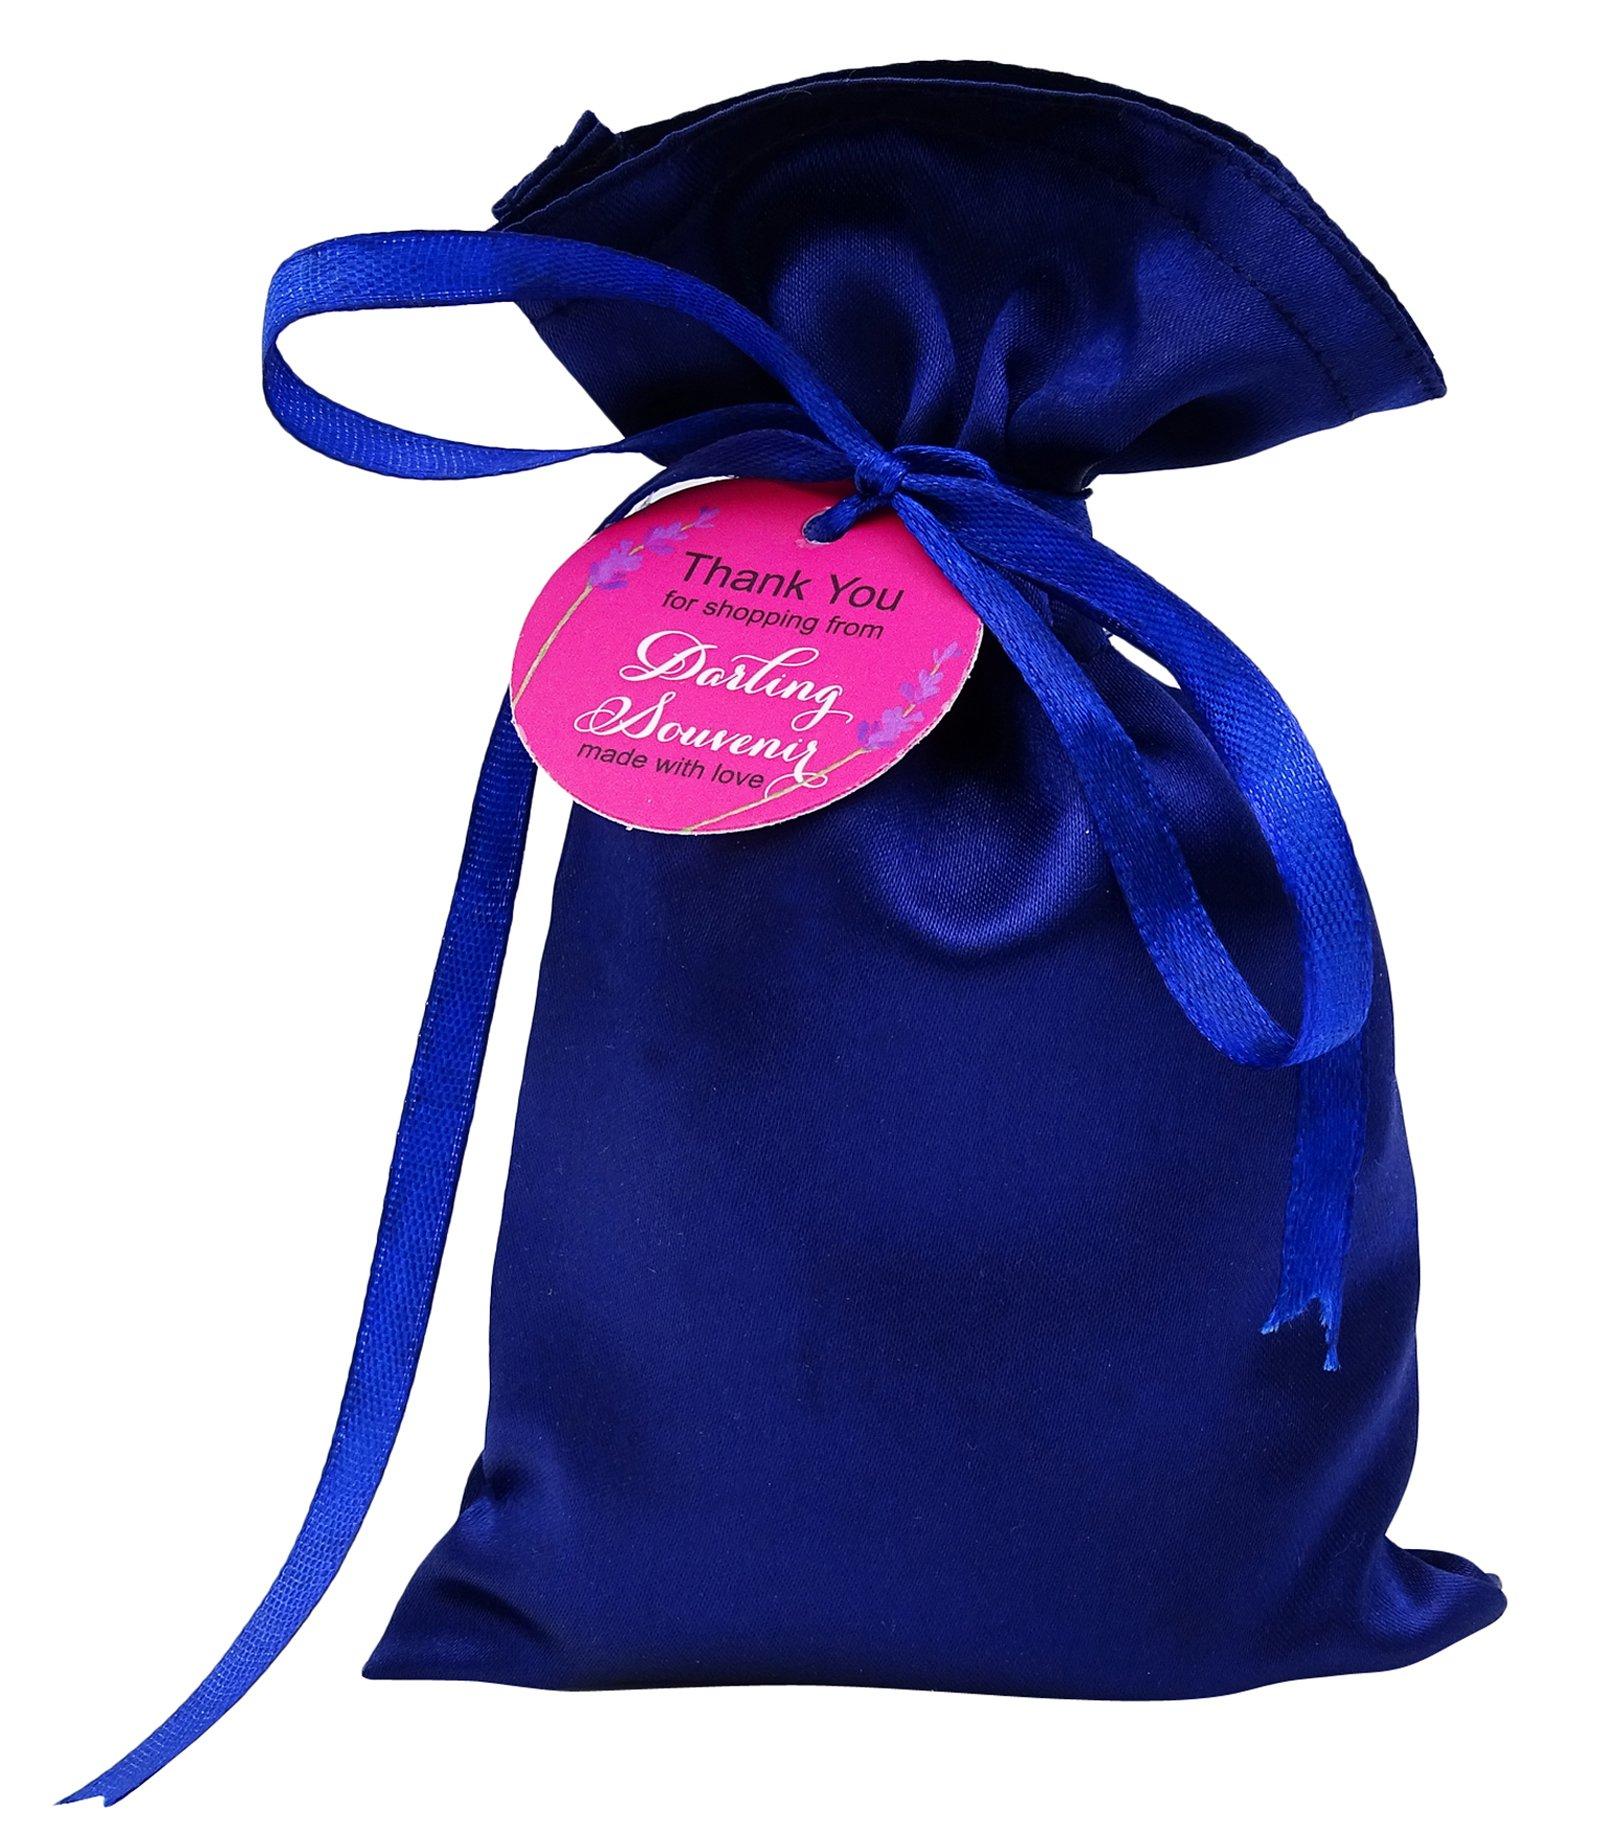 Darling Souvenir Custom Hang Tags Sending You SMore Love Favor Gift Tags Personalized Fancy Bonbonniere Tag-Burlap-100 Tags